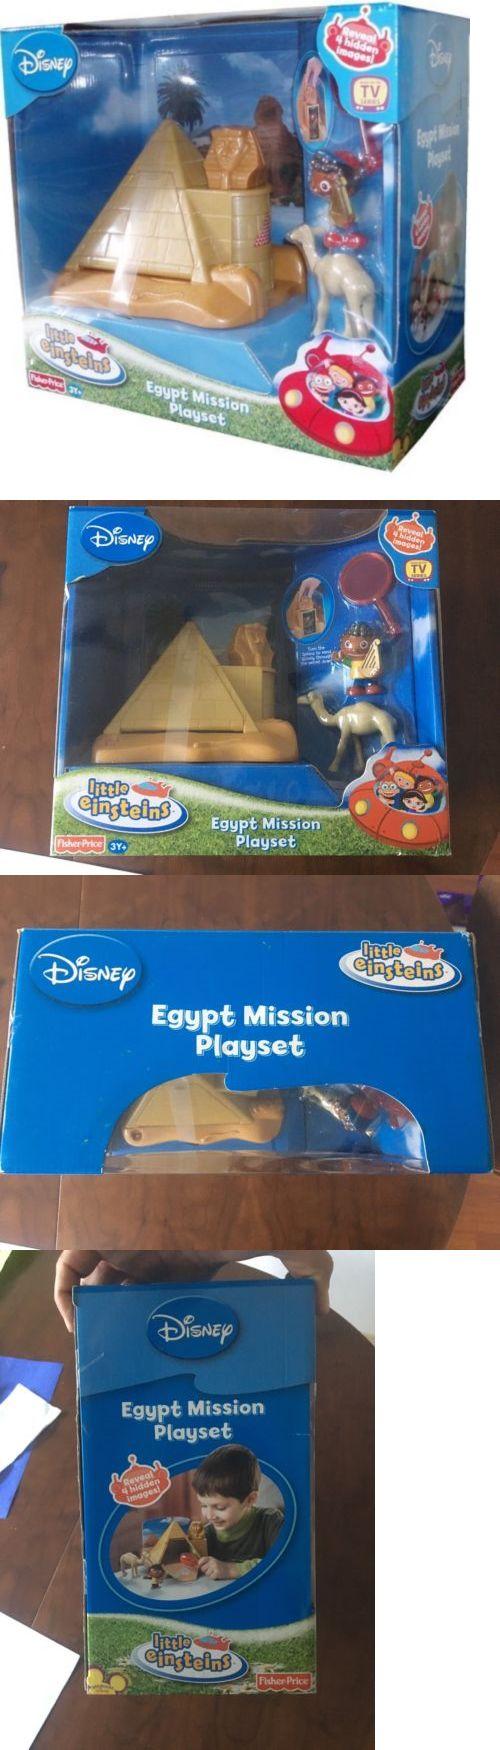 Uncategorized fisher price comfort curve bouncer new free shipping ebay - Little Einsteins 158766 New Disney Little Einsteins Golden Pyramid Egypt Mission Playset Toy Ships Free